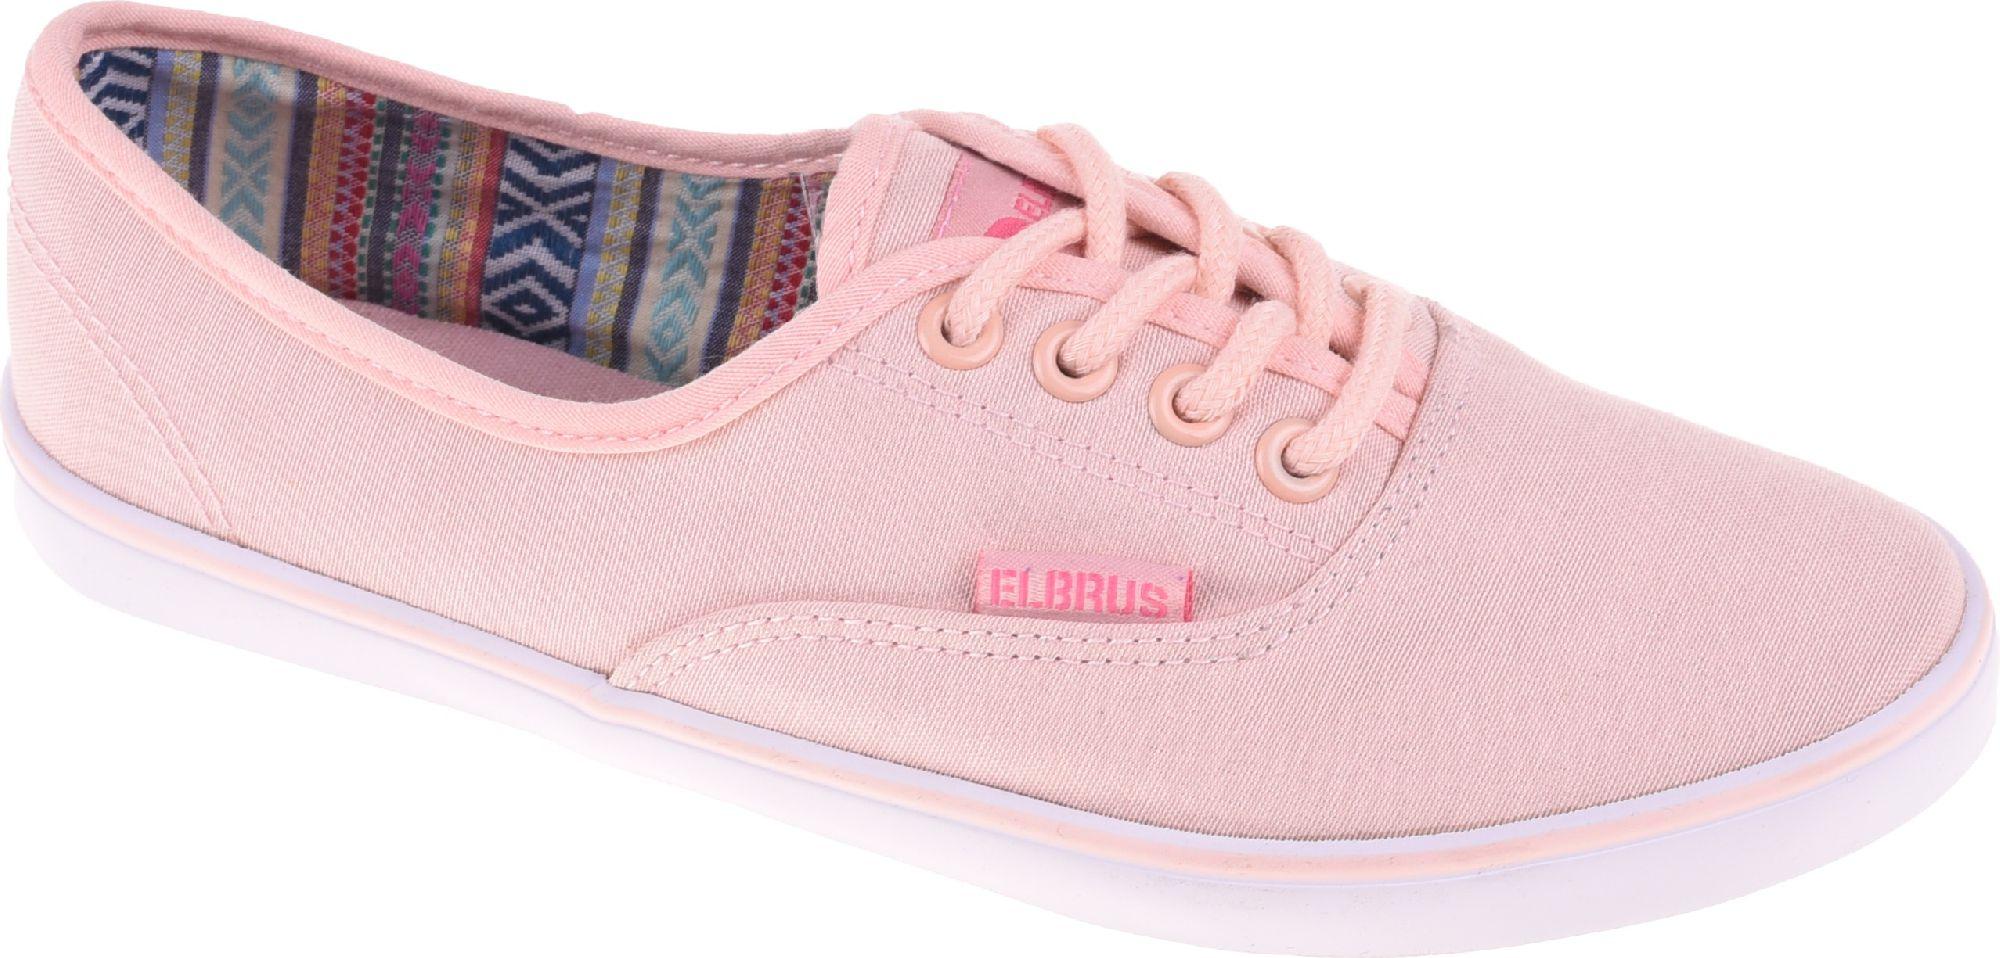 Elbrus Buty Damskie Marlene Wo's Old Pink r. 41 5901979148623